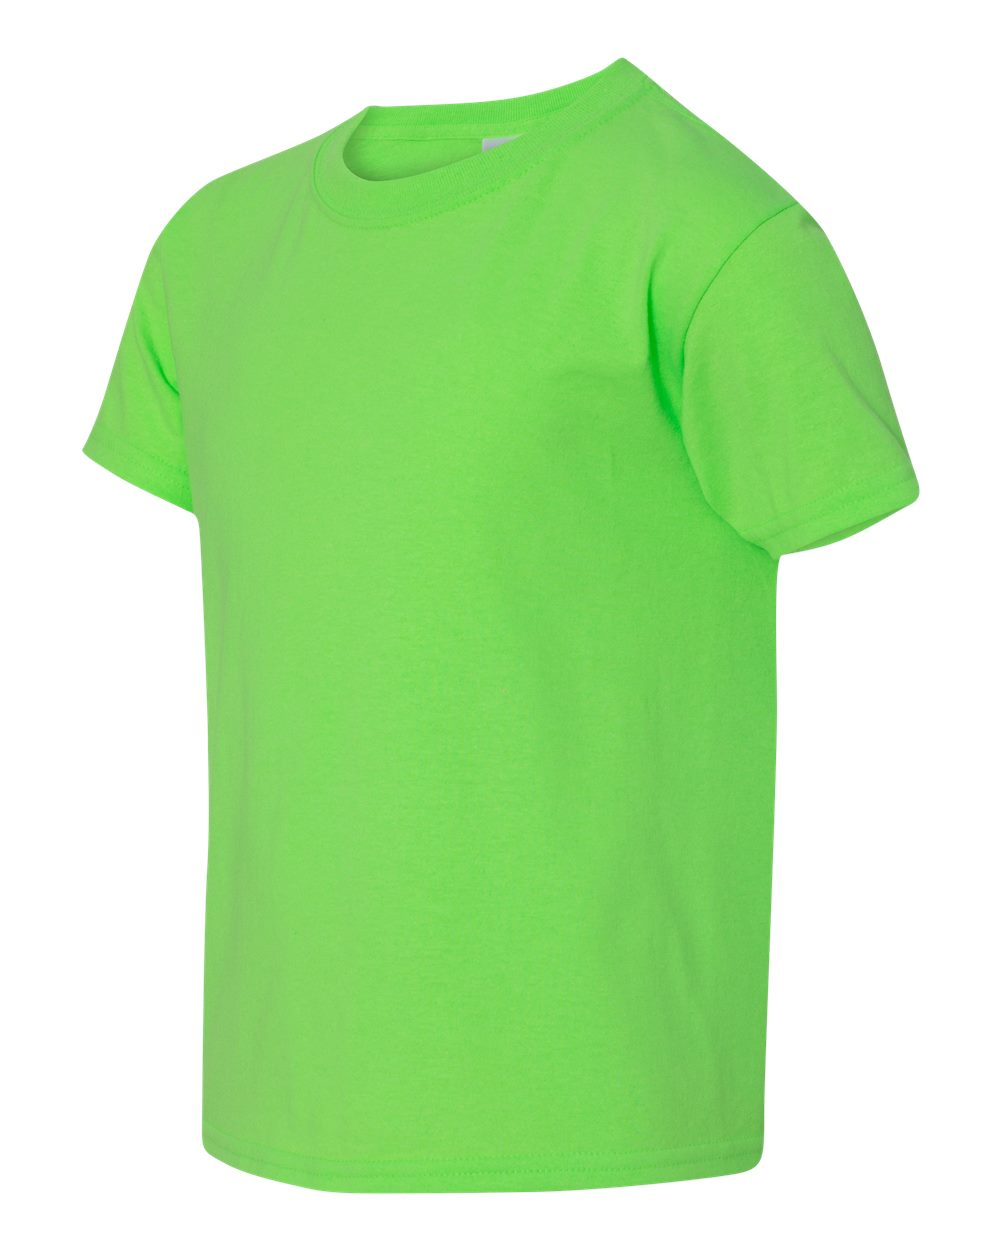 Gildan 5000b heavy cotton youth t shirt friendly for Kids t shirt printing